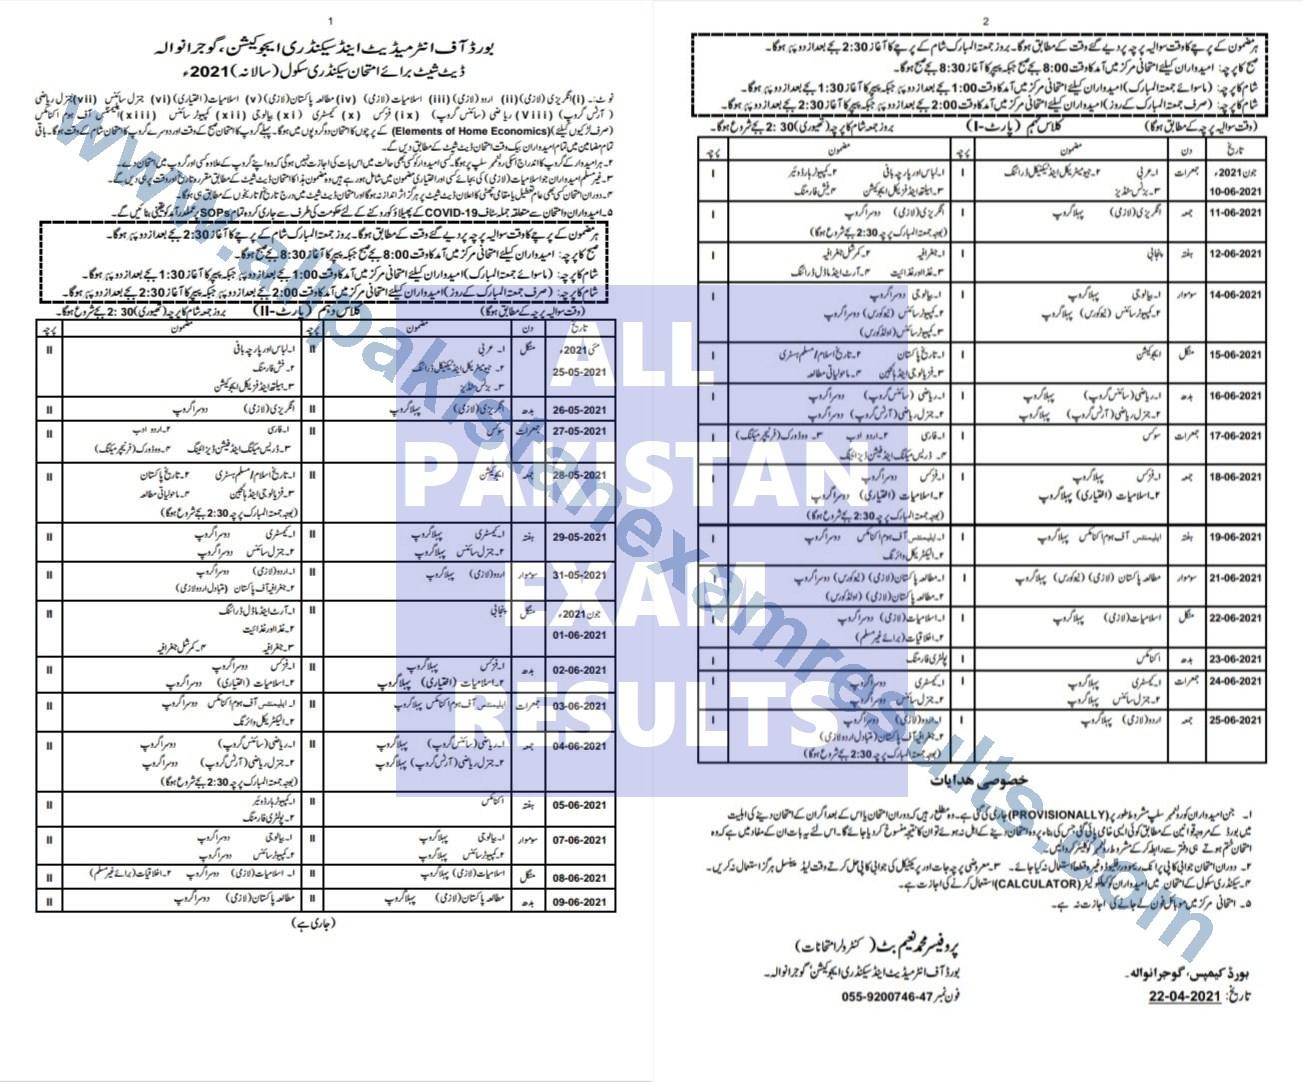 BISE Gujranwala Matric Date Sheet 2021 Annual